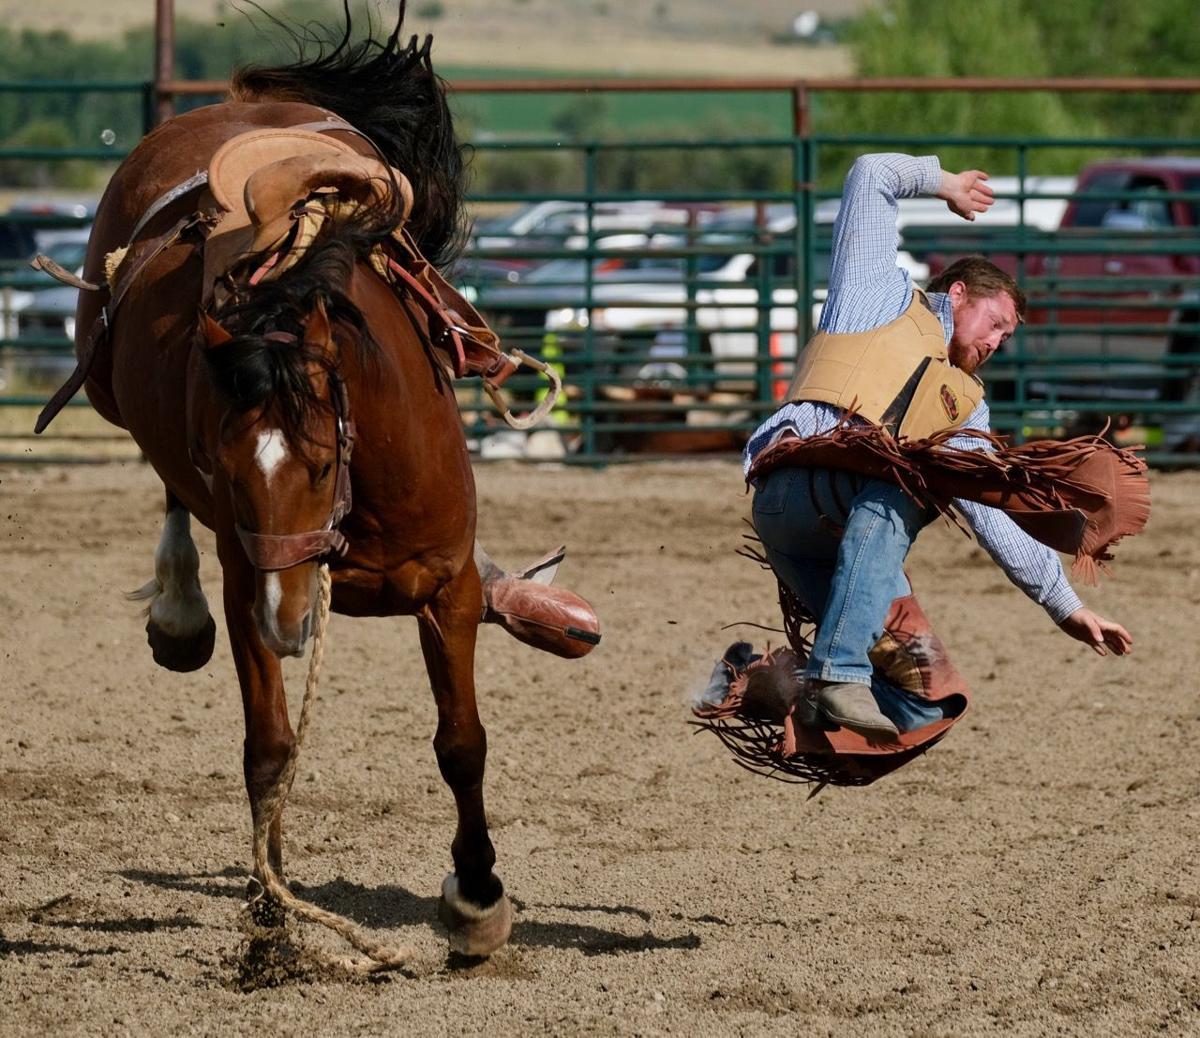 082819 NRA Rodeo Chris Mutchler.jpg